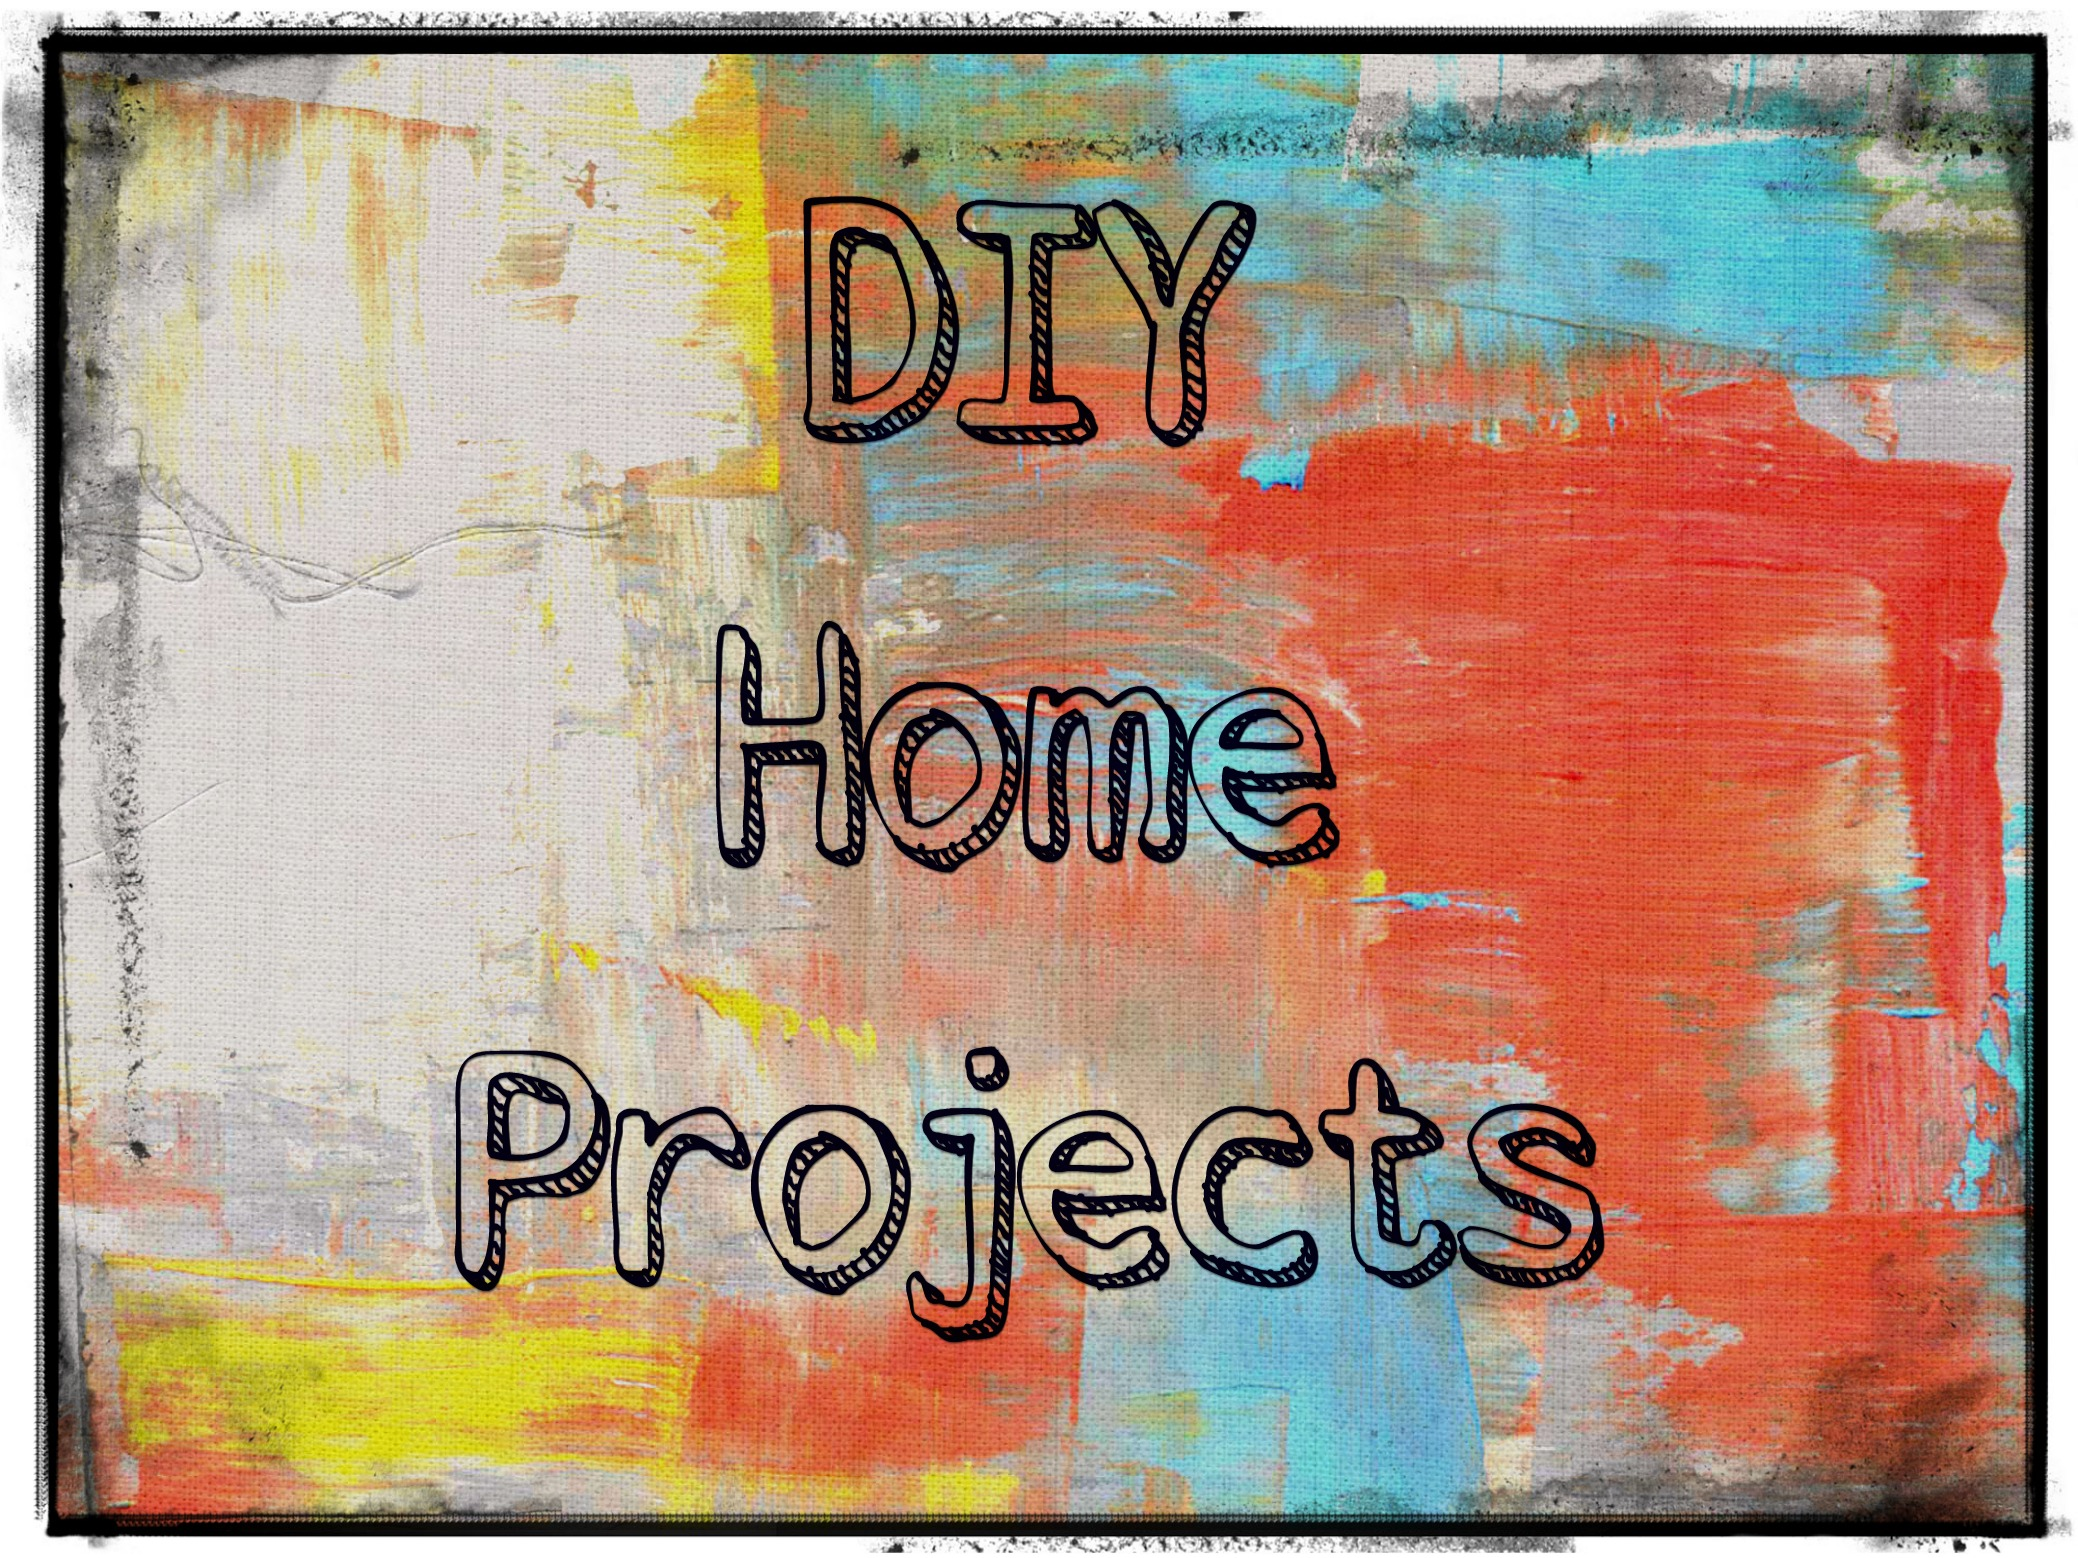 Diy tips around the house